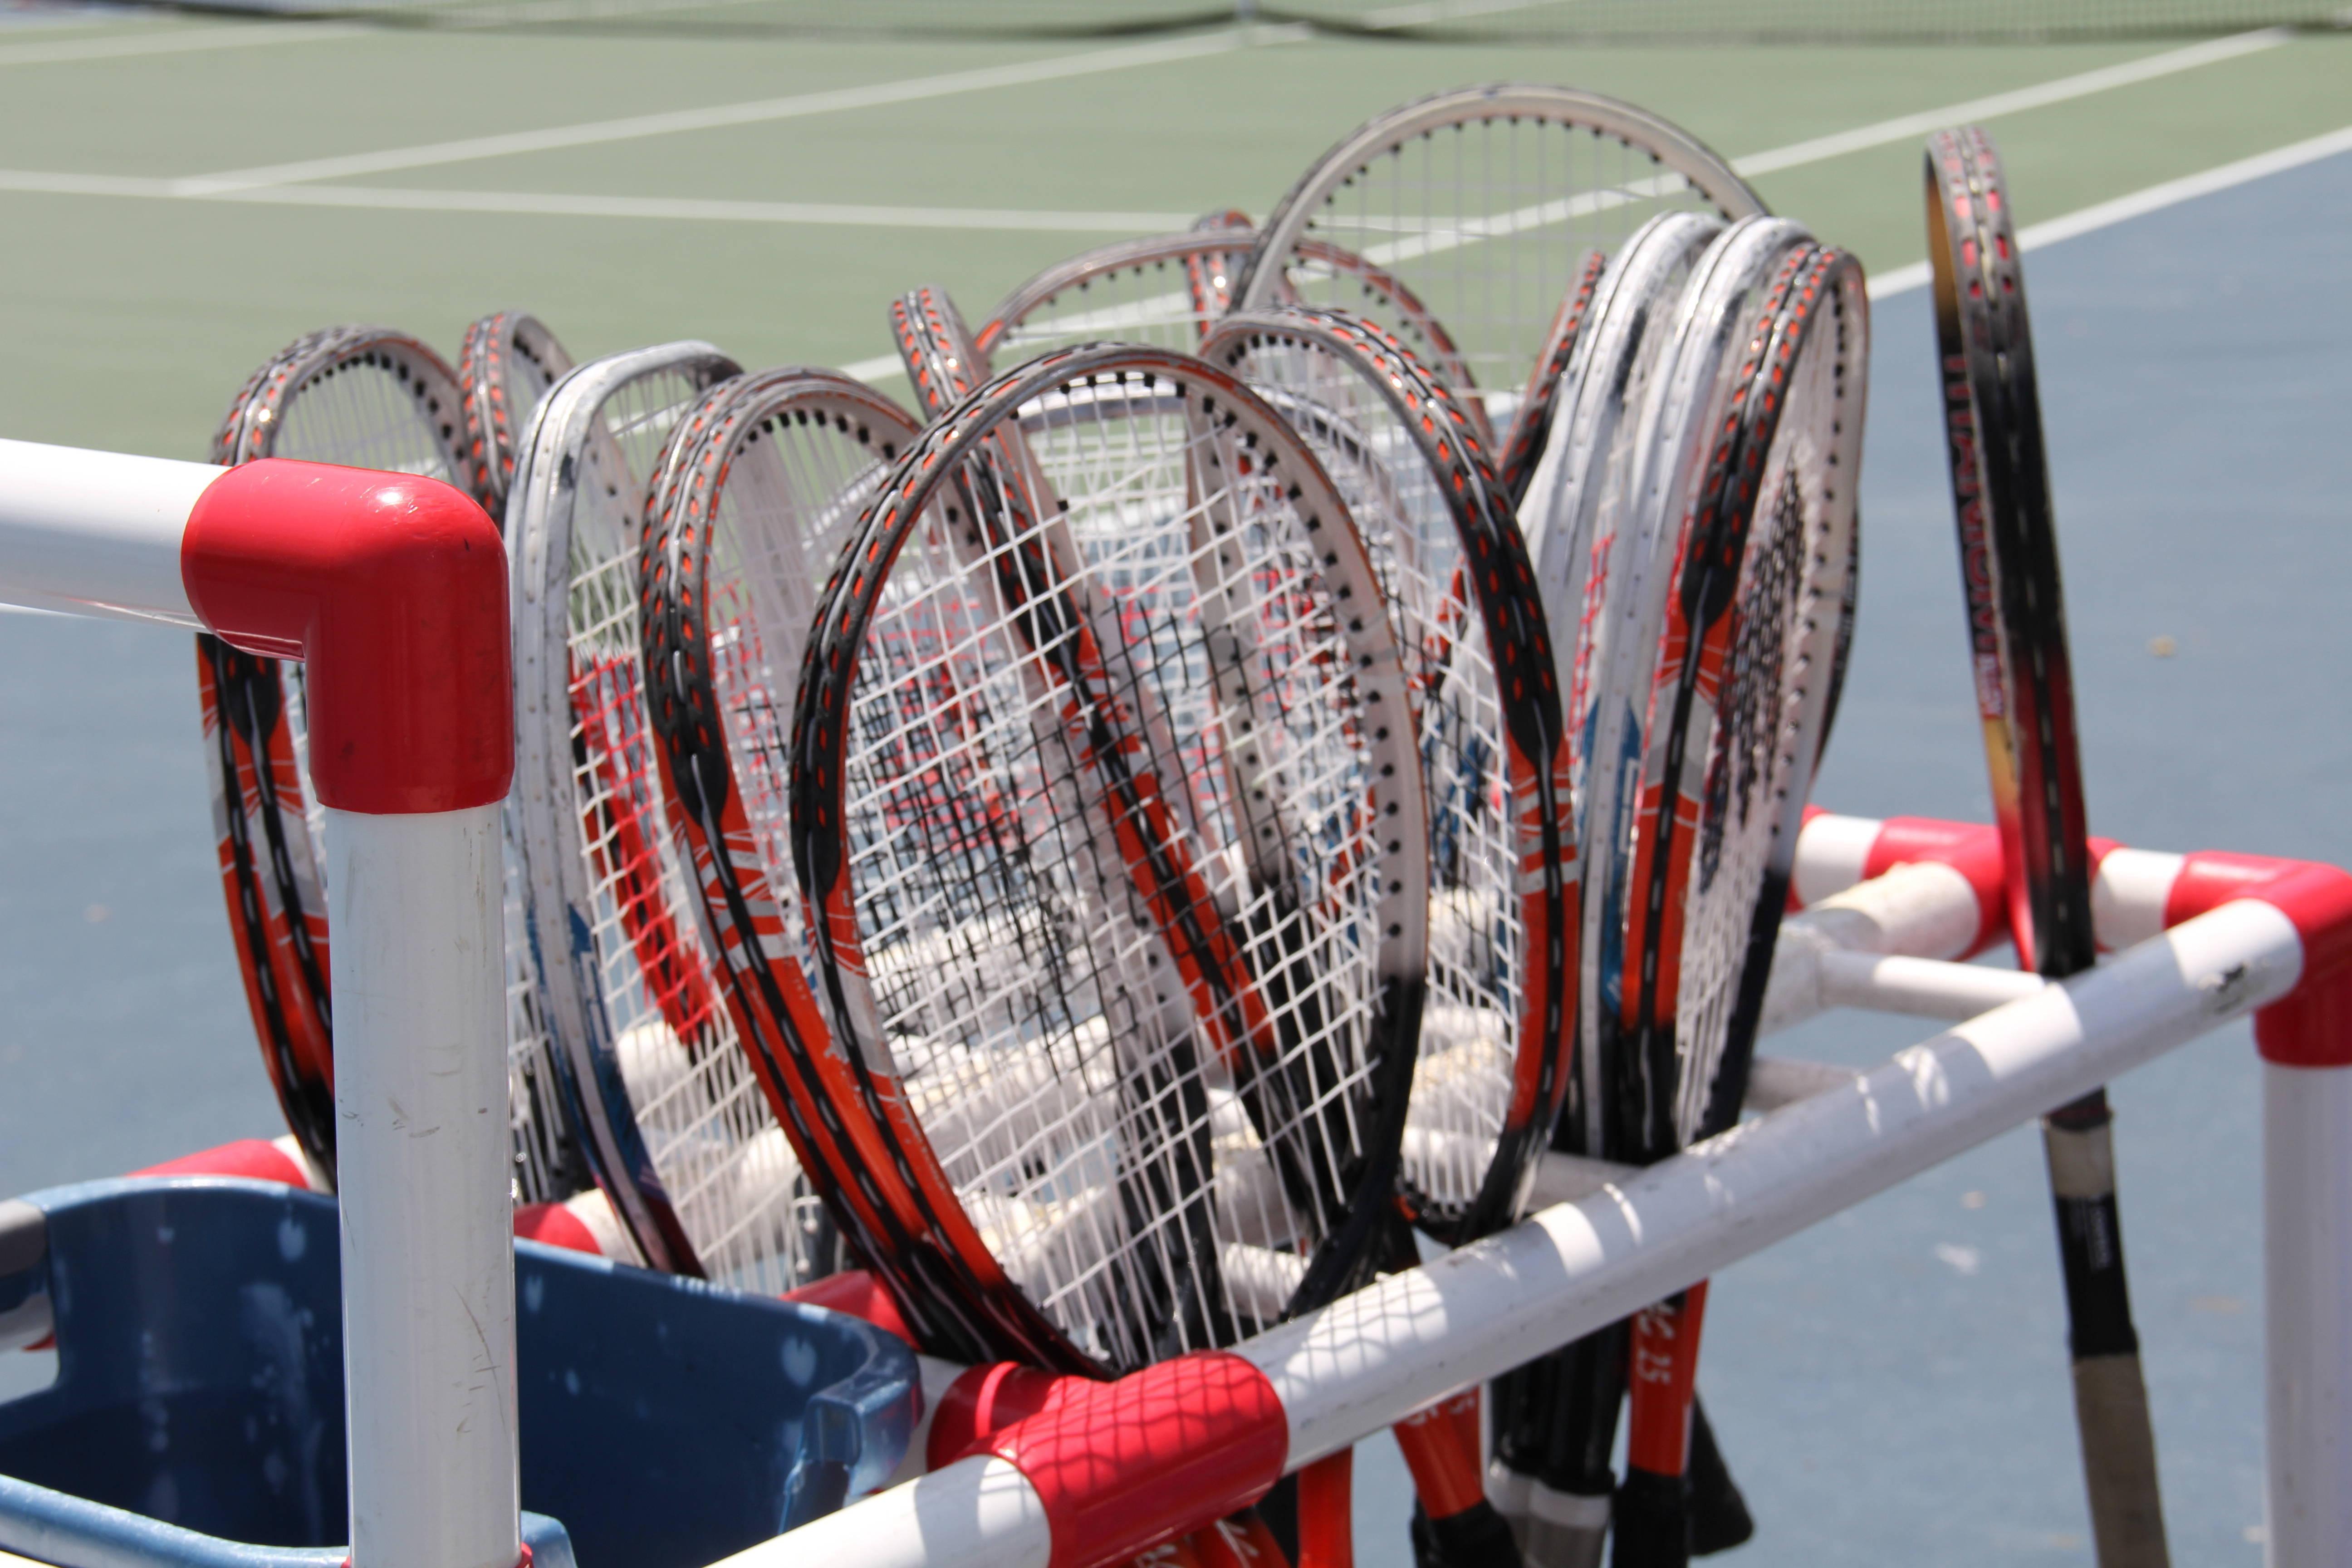 Sparta High School Tennis